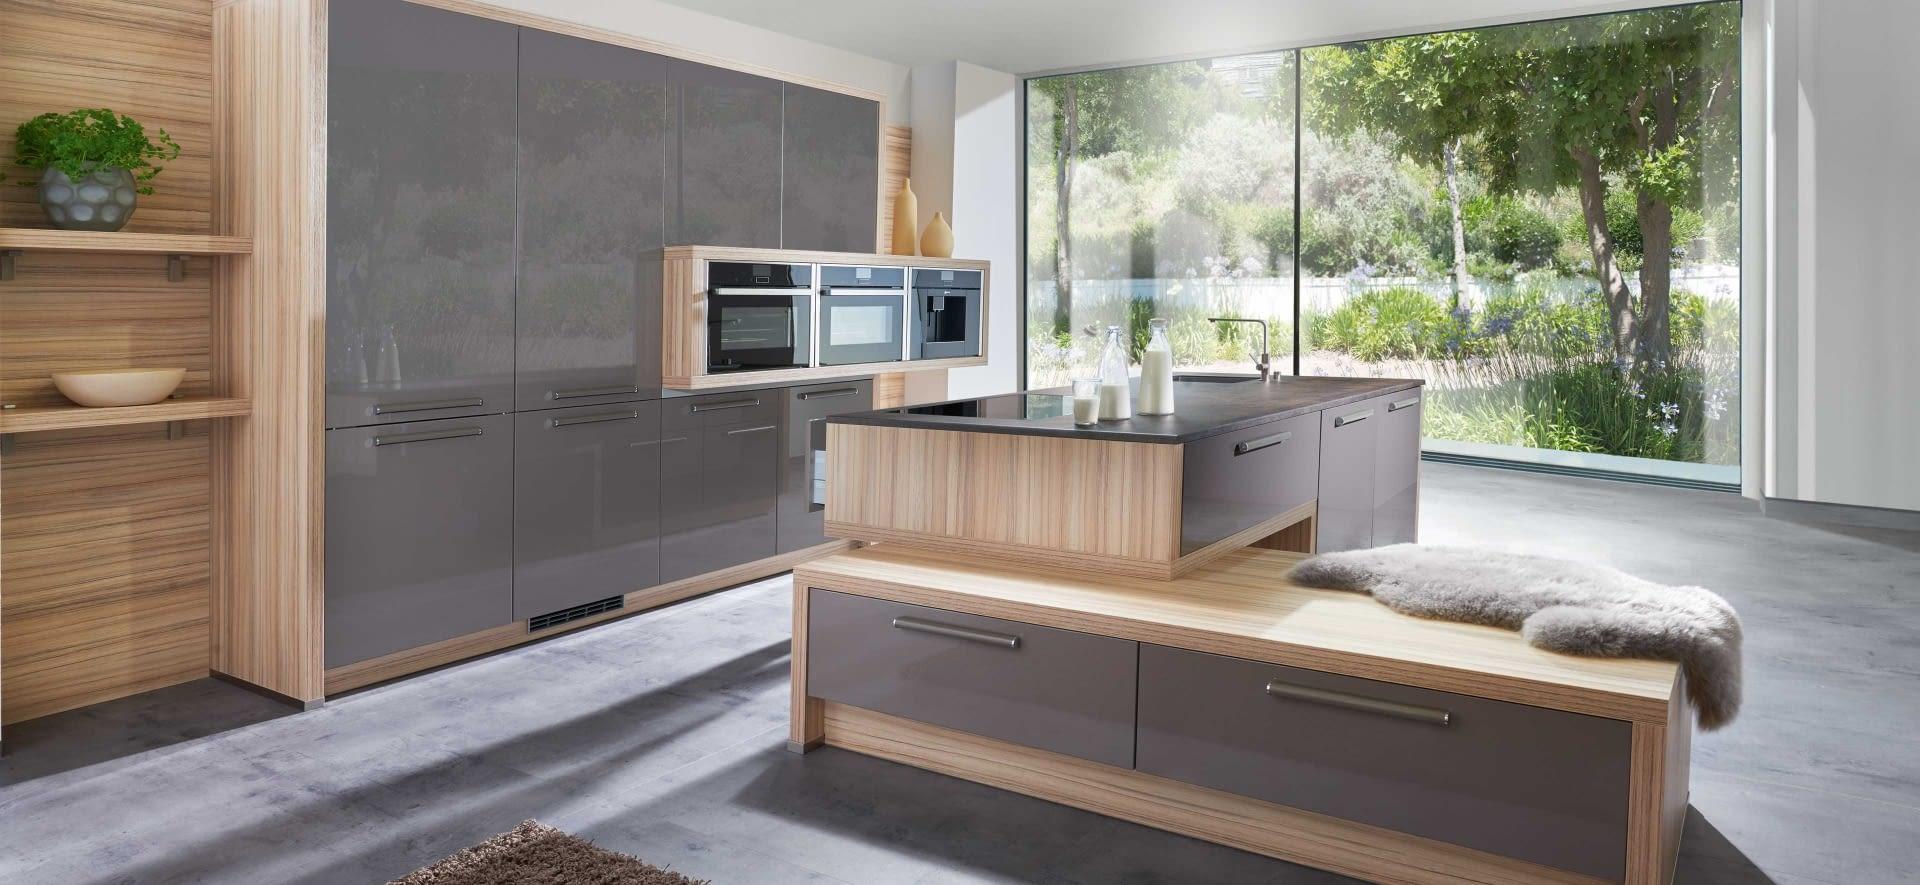 inselk che nova lack magma mit erz braun marquardt k chen. Black Bedroom Furniture Sets. Home Design Ideas